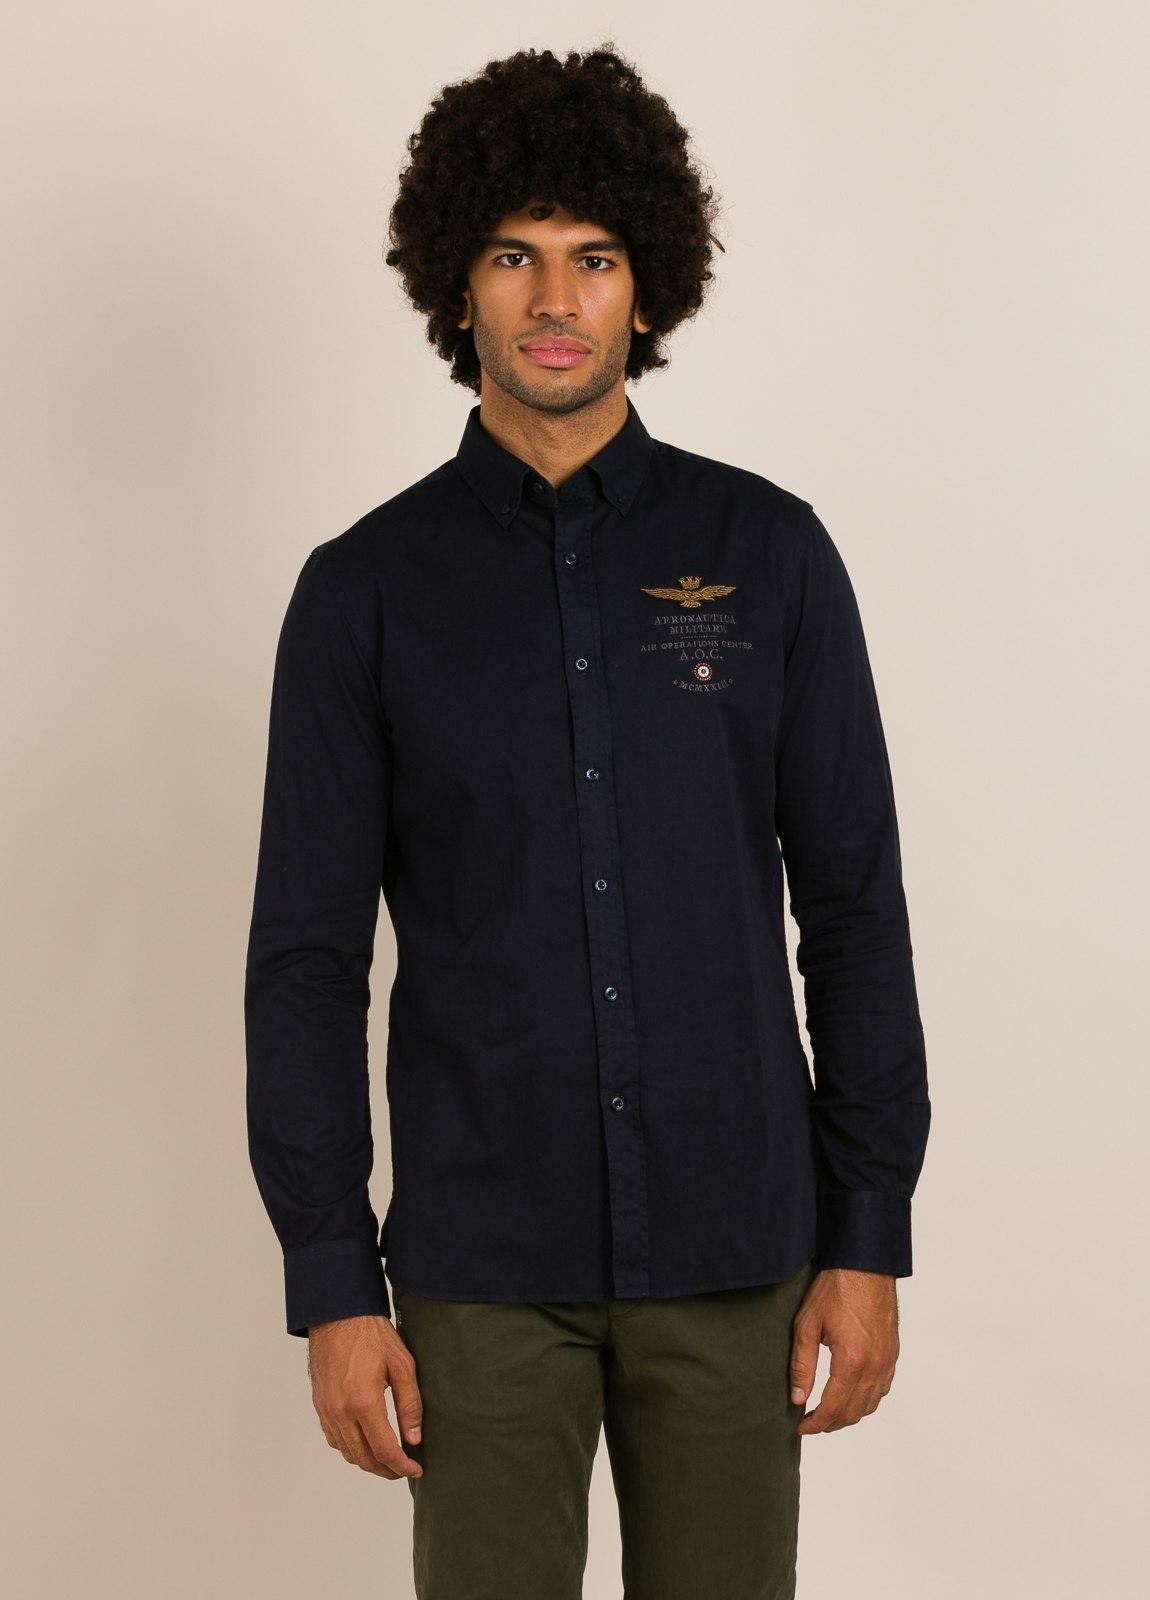 Camisa AERONAUTICA MILITARE azul marino - Ítem1